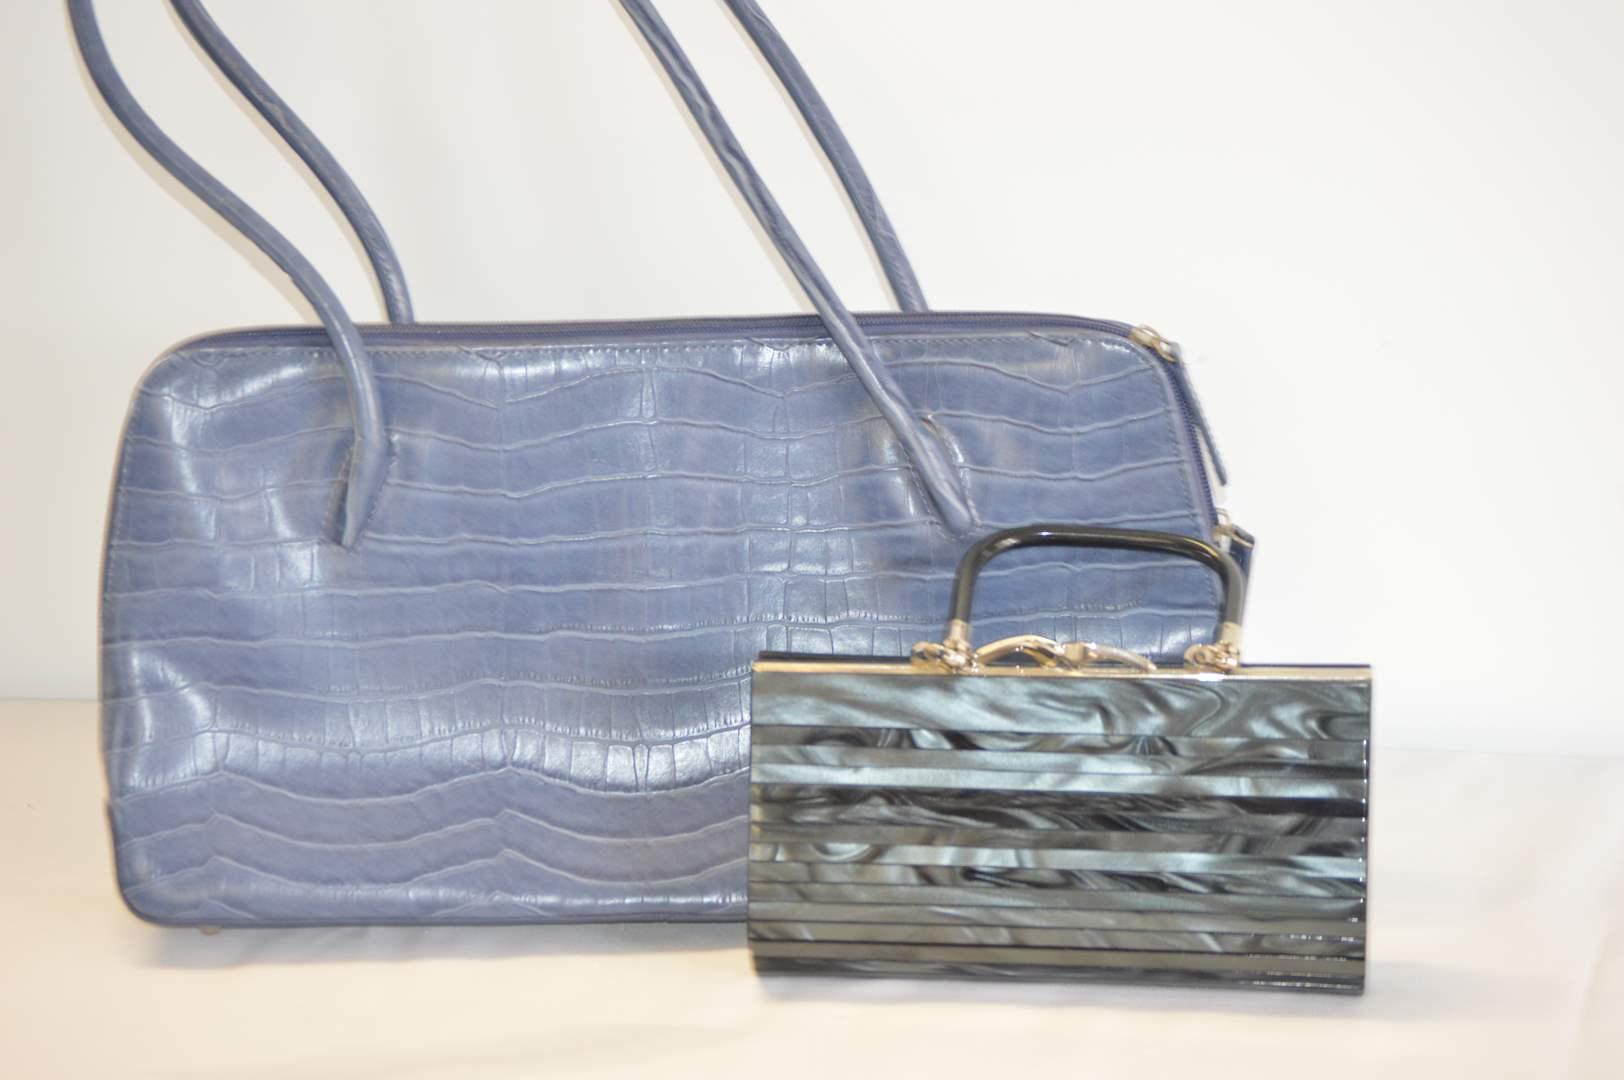 Lot # 8 Designer handbag and purse/clutch by L. Erickson (main image)